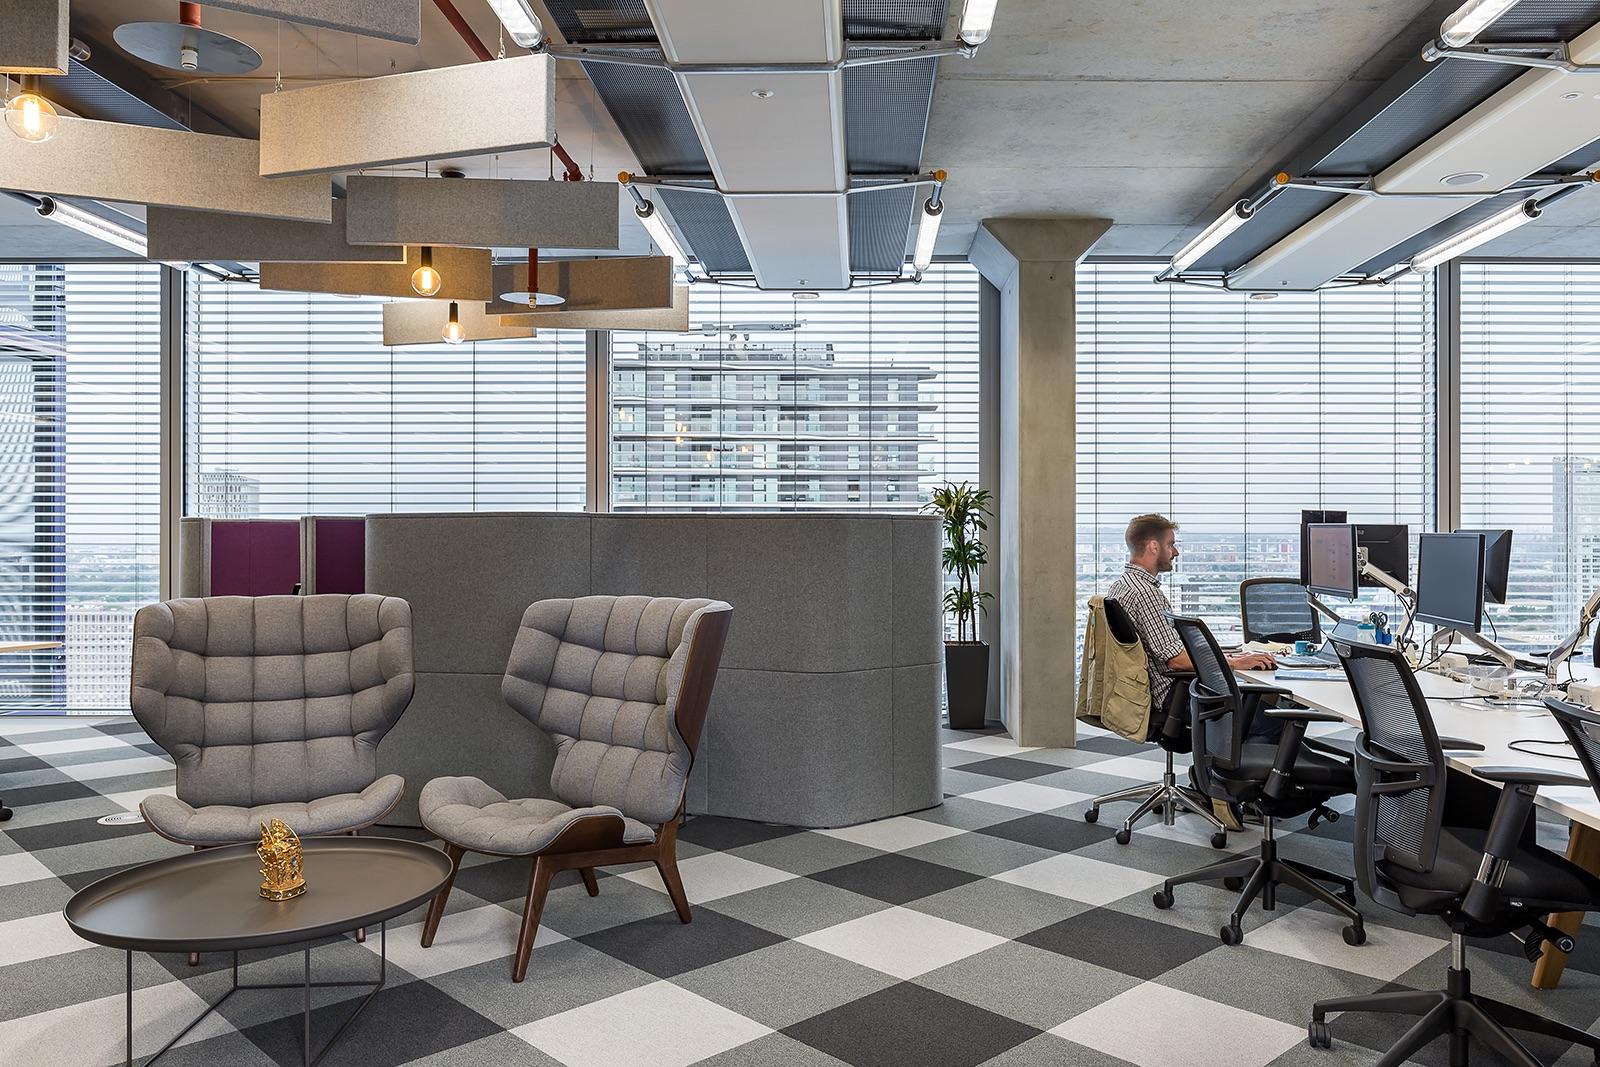 unicef-london-office-13